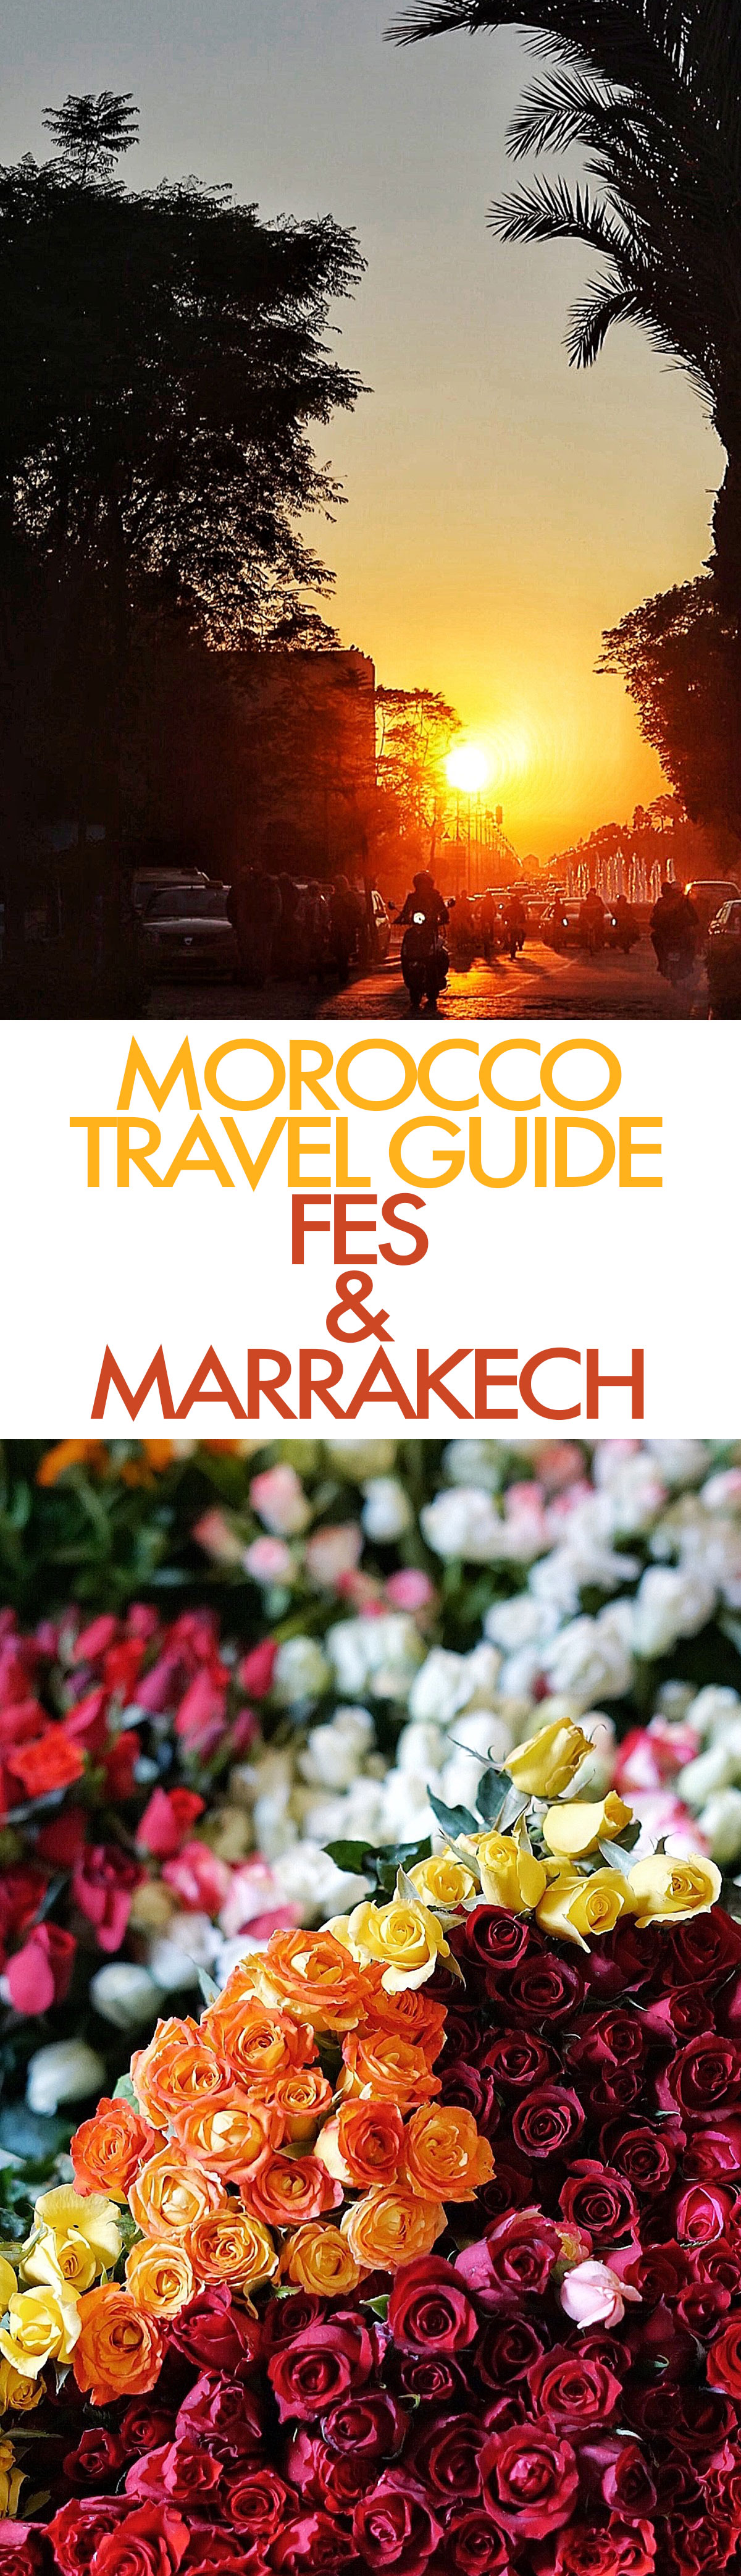 Morocco Guide: Fes & Marrakech